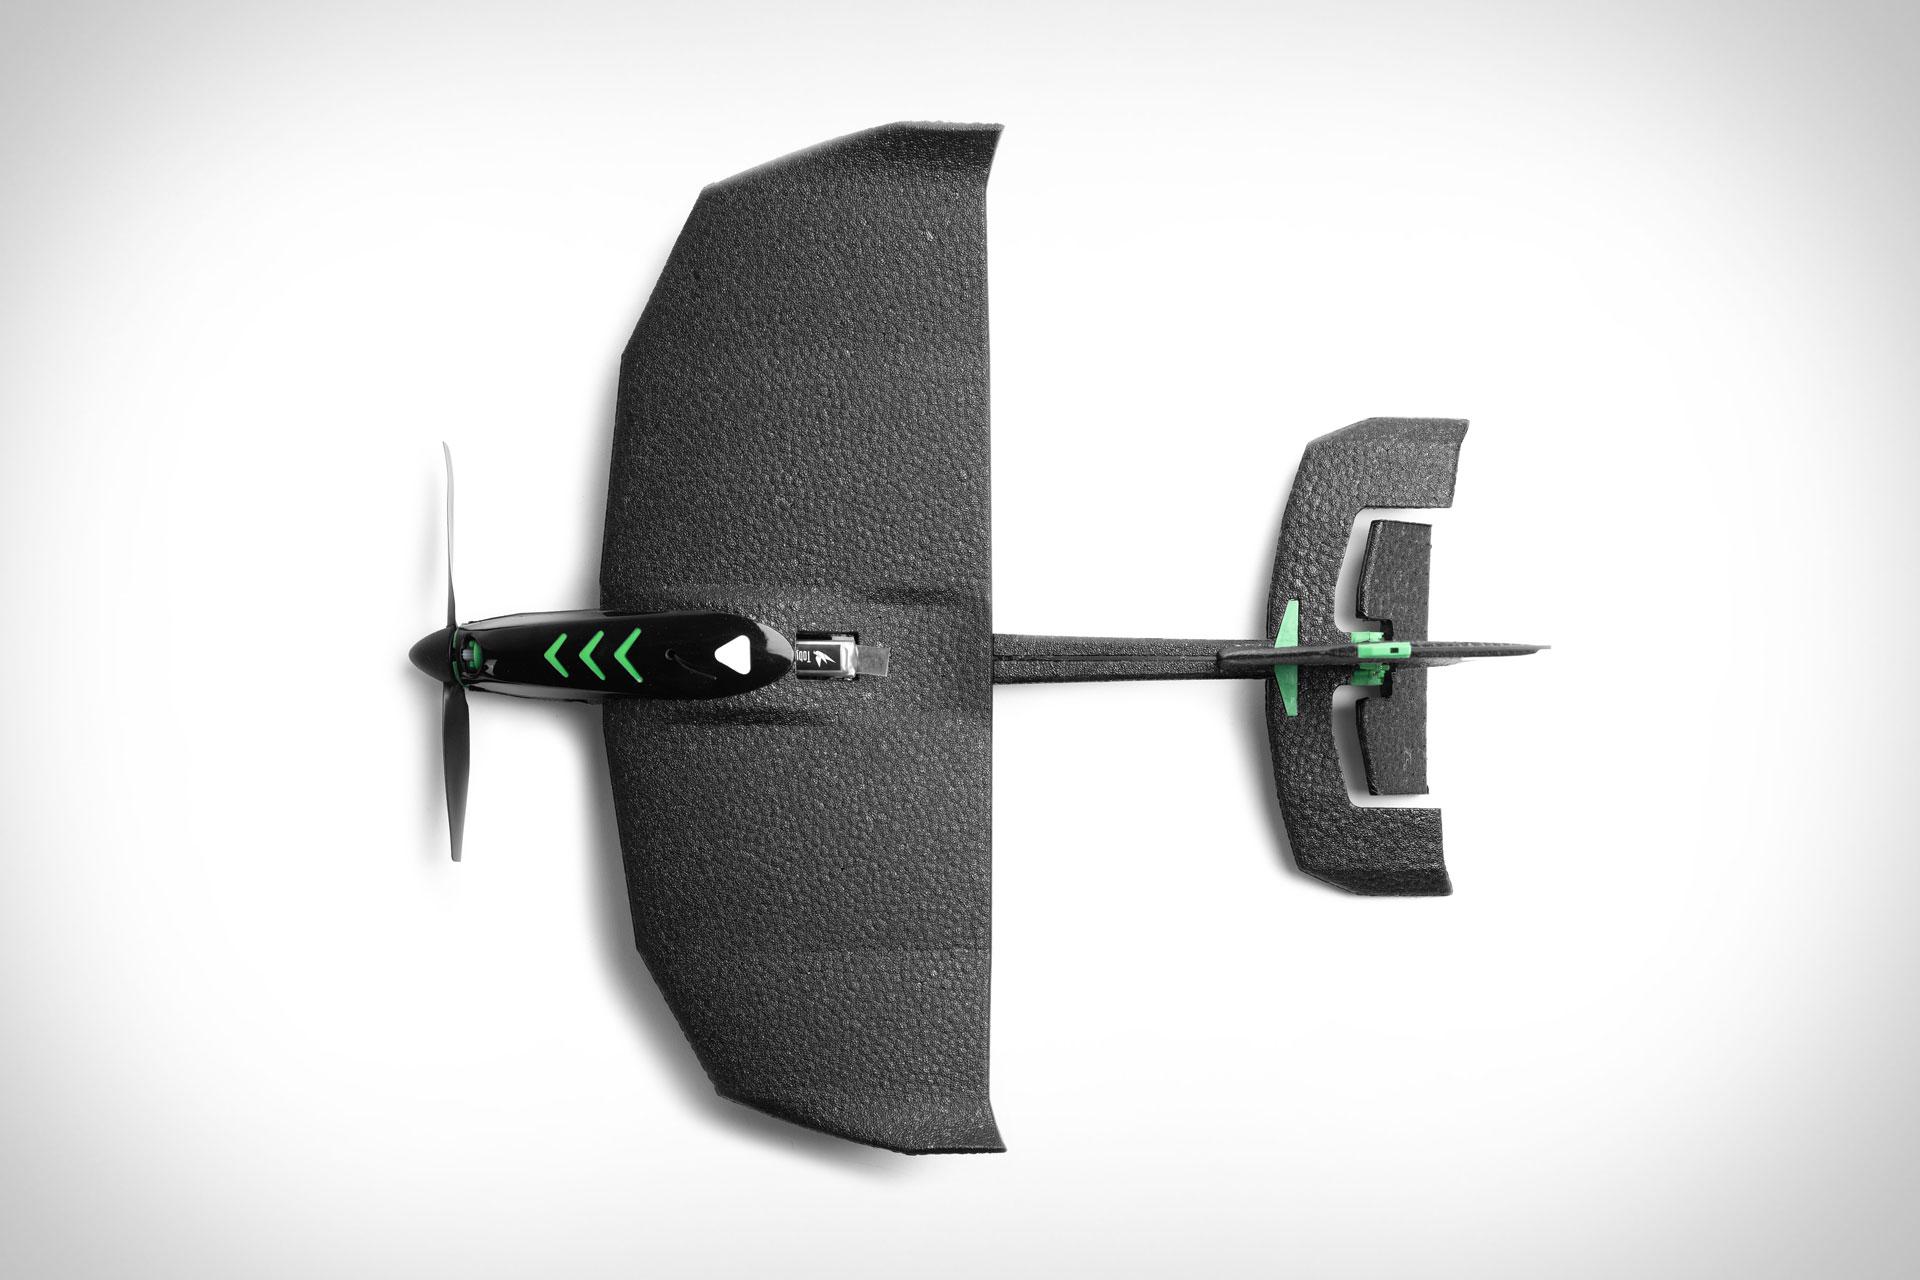 TobyRich SmartPlane Pro Drone